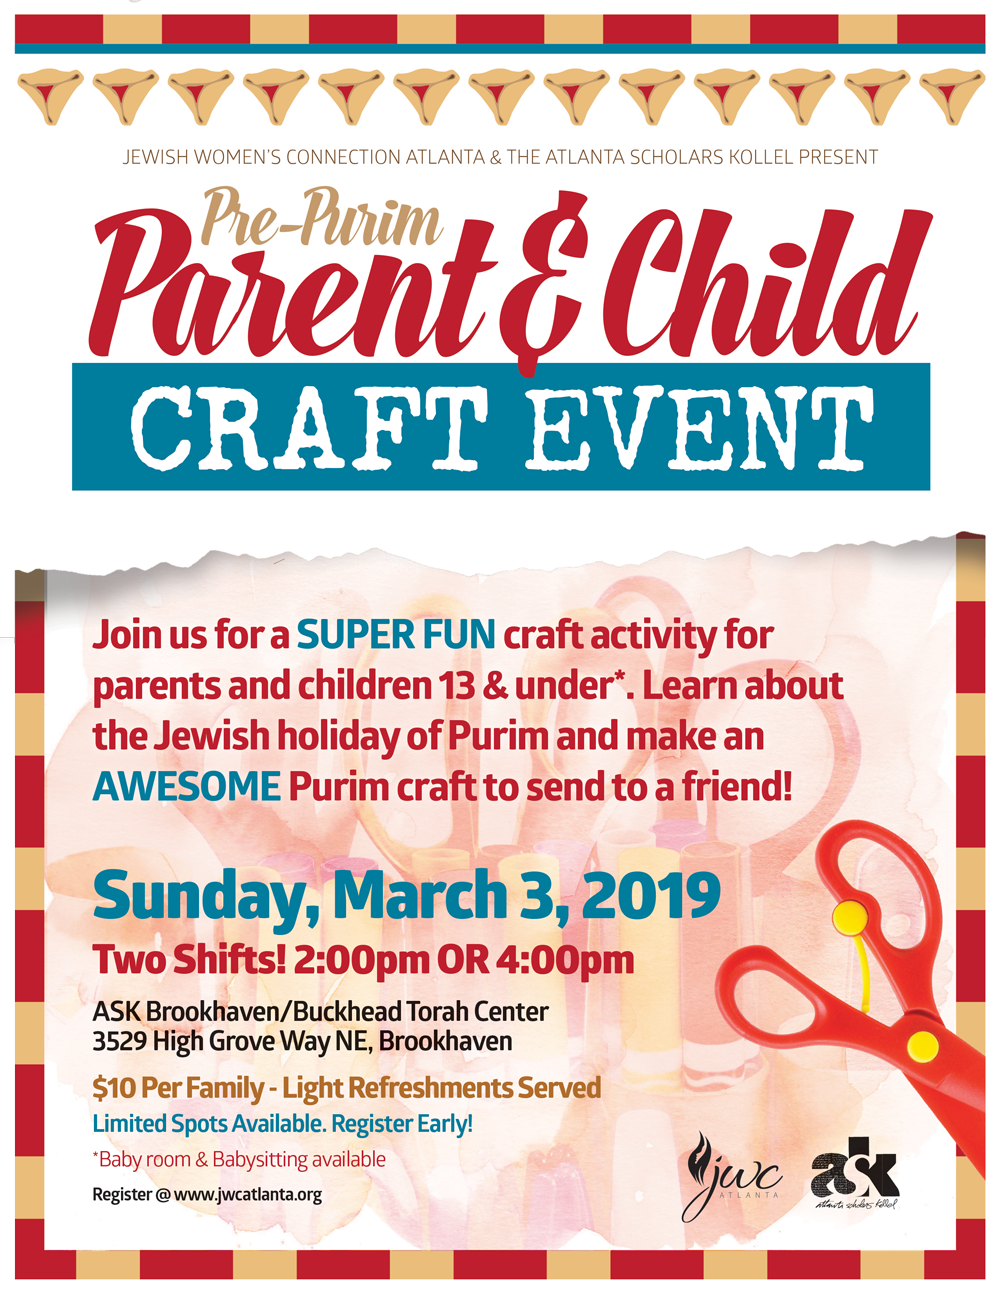 JWCA_Purim-Kids-Event_Flyer_Final.png